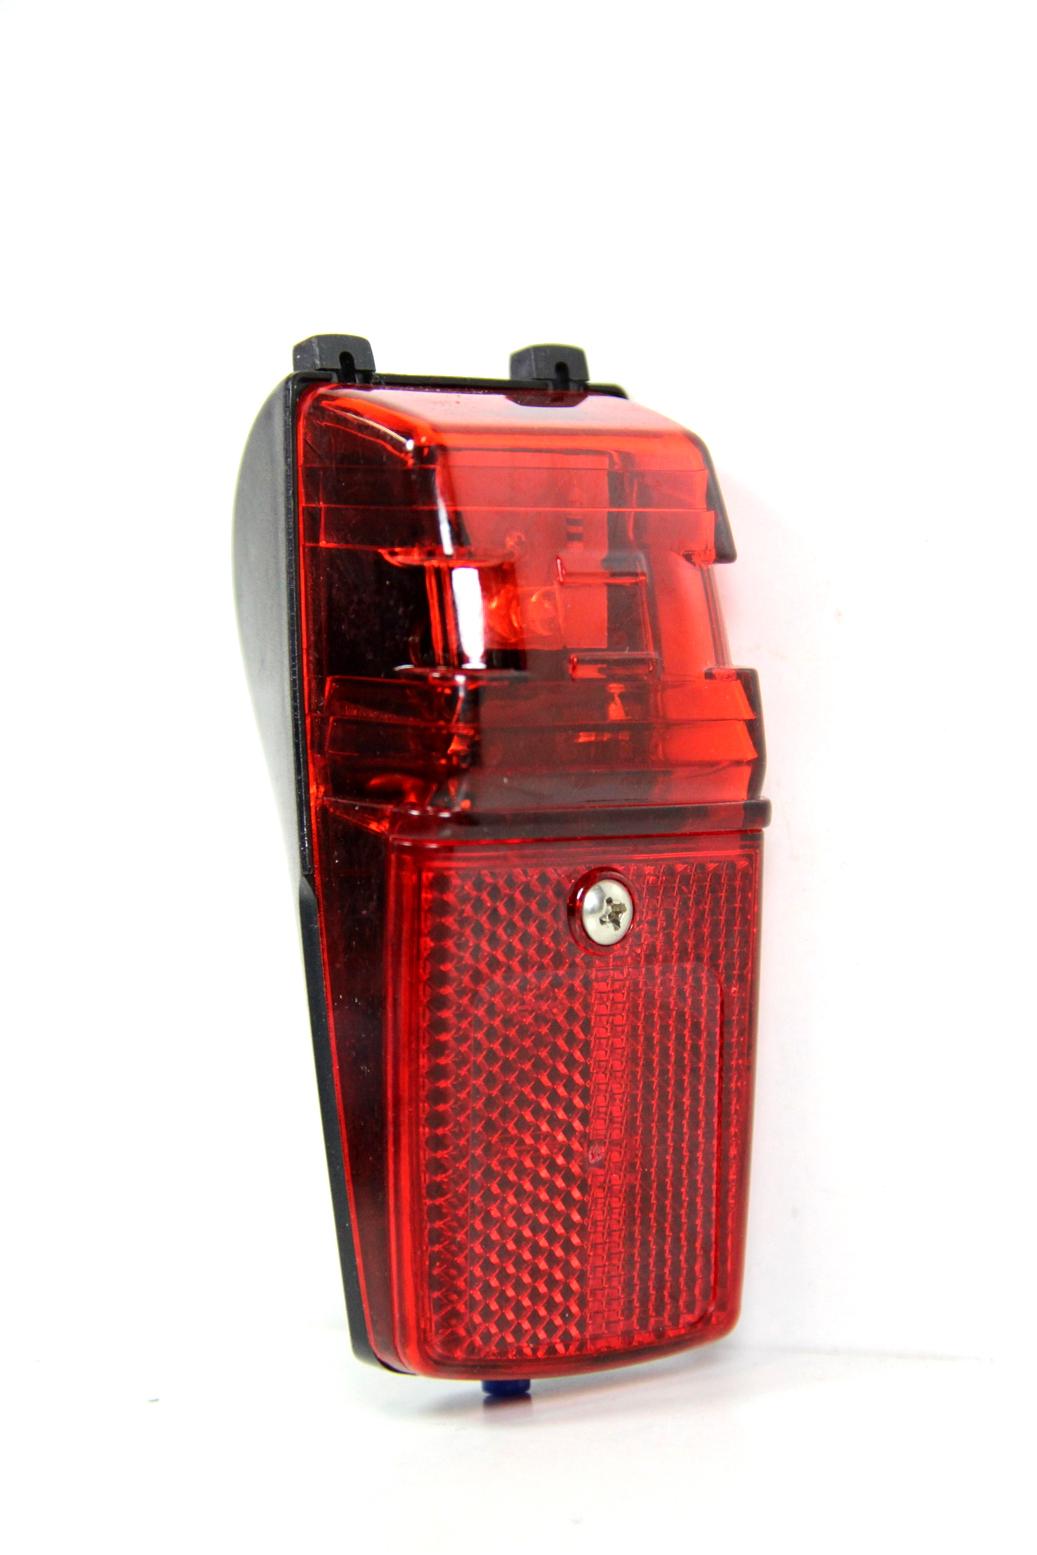 fahrrad led r cklicht mit reflektor an aus akku batterie beleuchtung r ckleuchte ebay. Black Bedroom Furniture Sets. Home Design Ideas